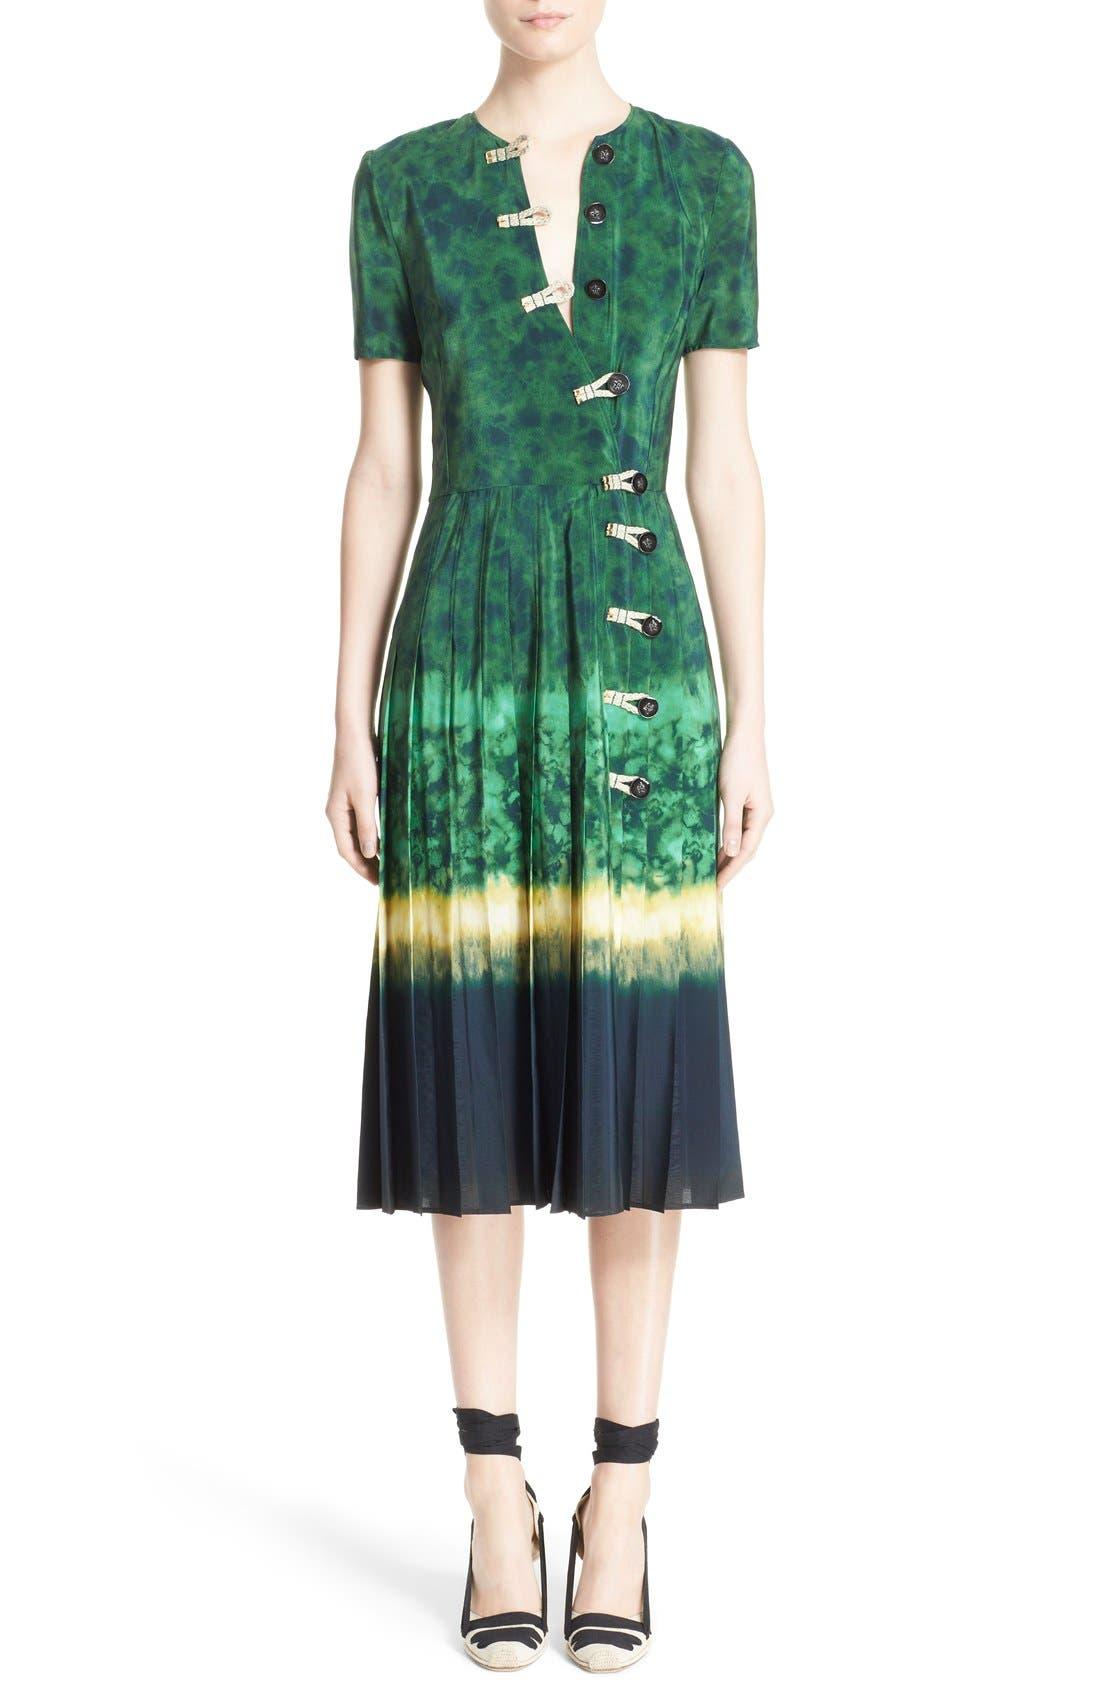 ALTUZARRA, 'Ilari' Rope Closure Dip Dye Dress, Main thumbnail 1, color, 340